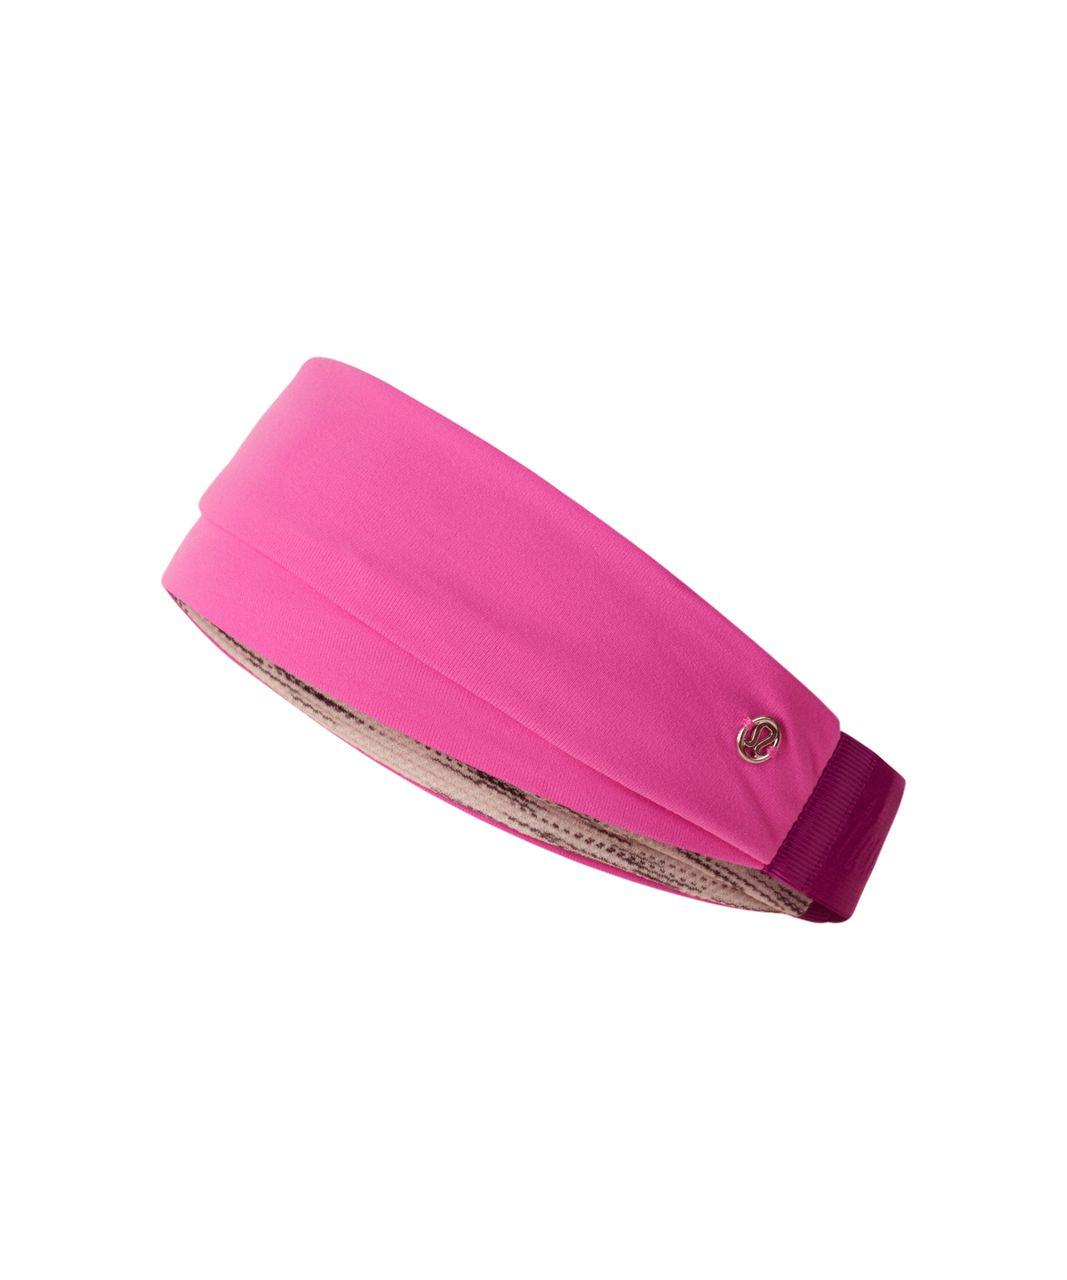 Lululemon Fringe Fighter Headband - Pink Paradise / Tiger Space Dye Black White / Regal Plum